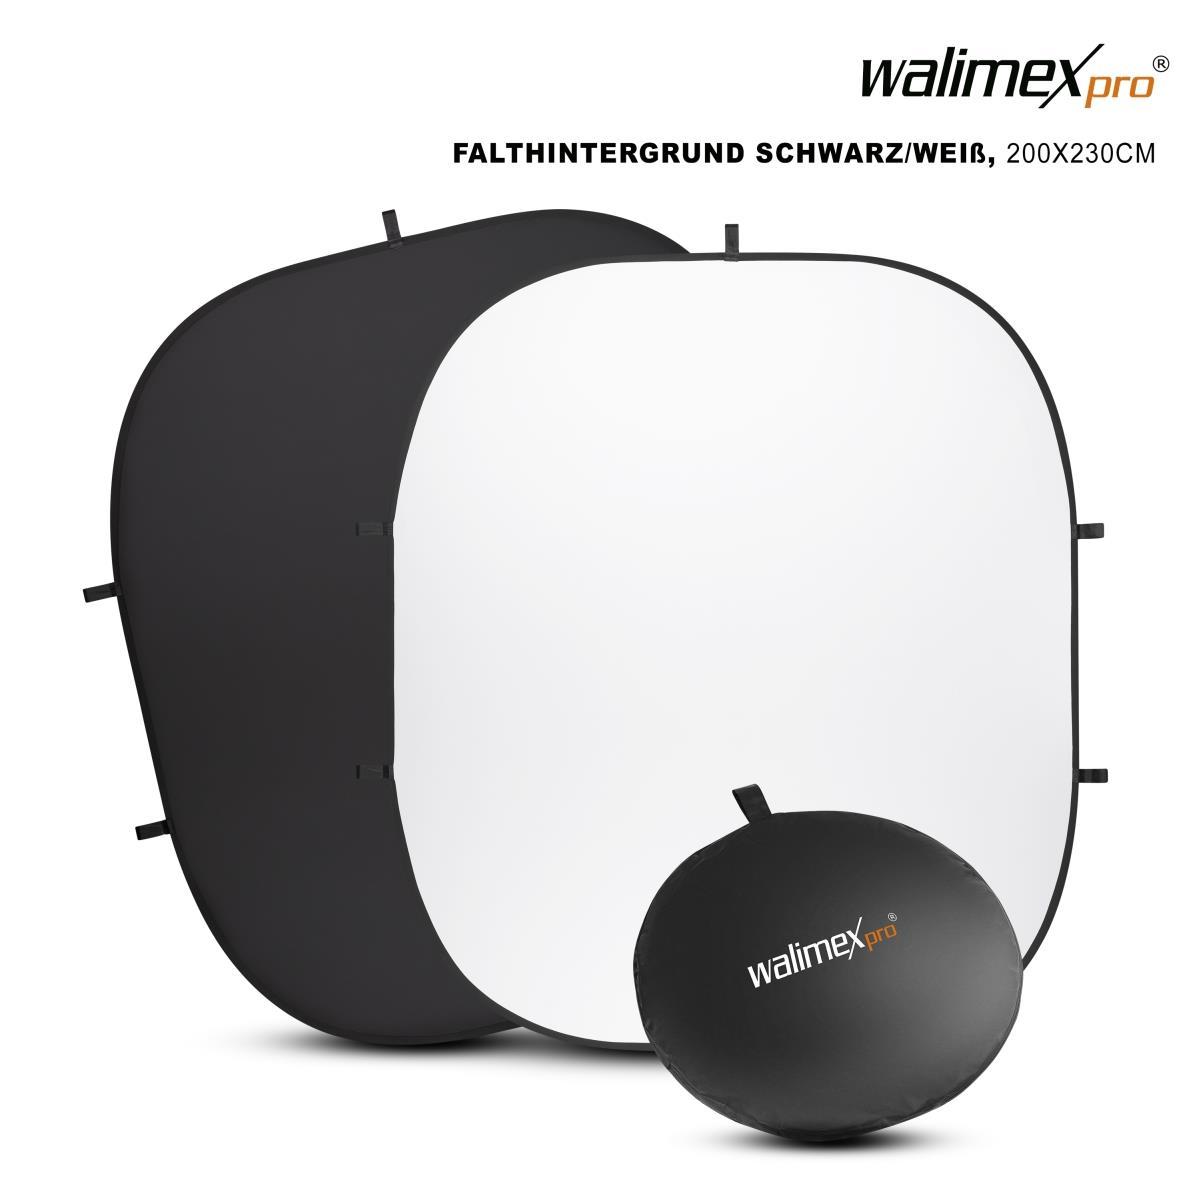 Walimex pro 2in1 Falthintergrund s/w 200x230cm